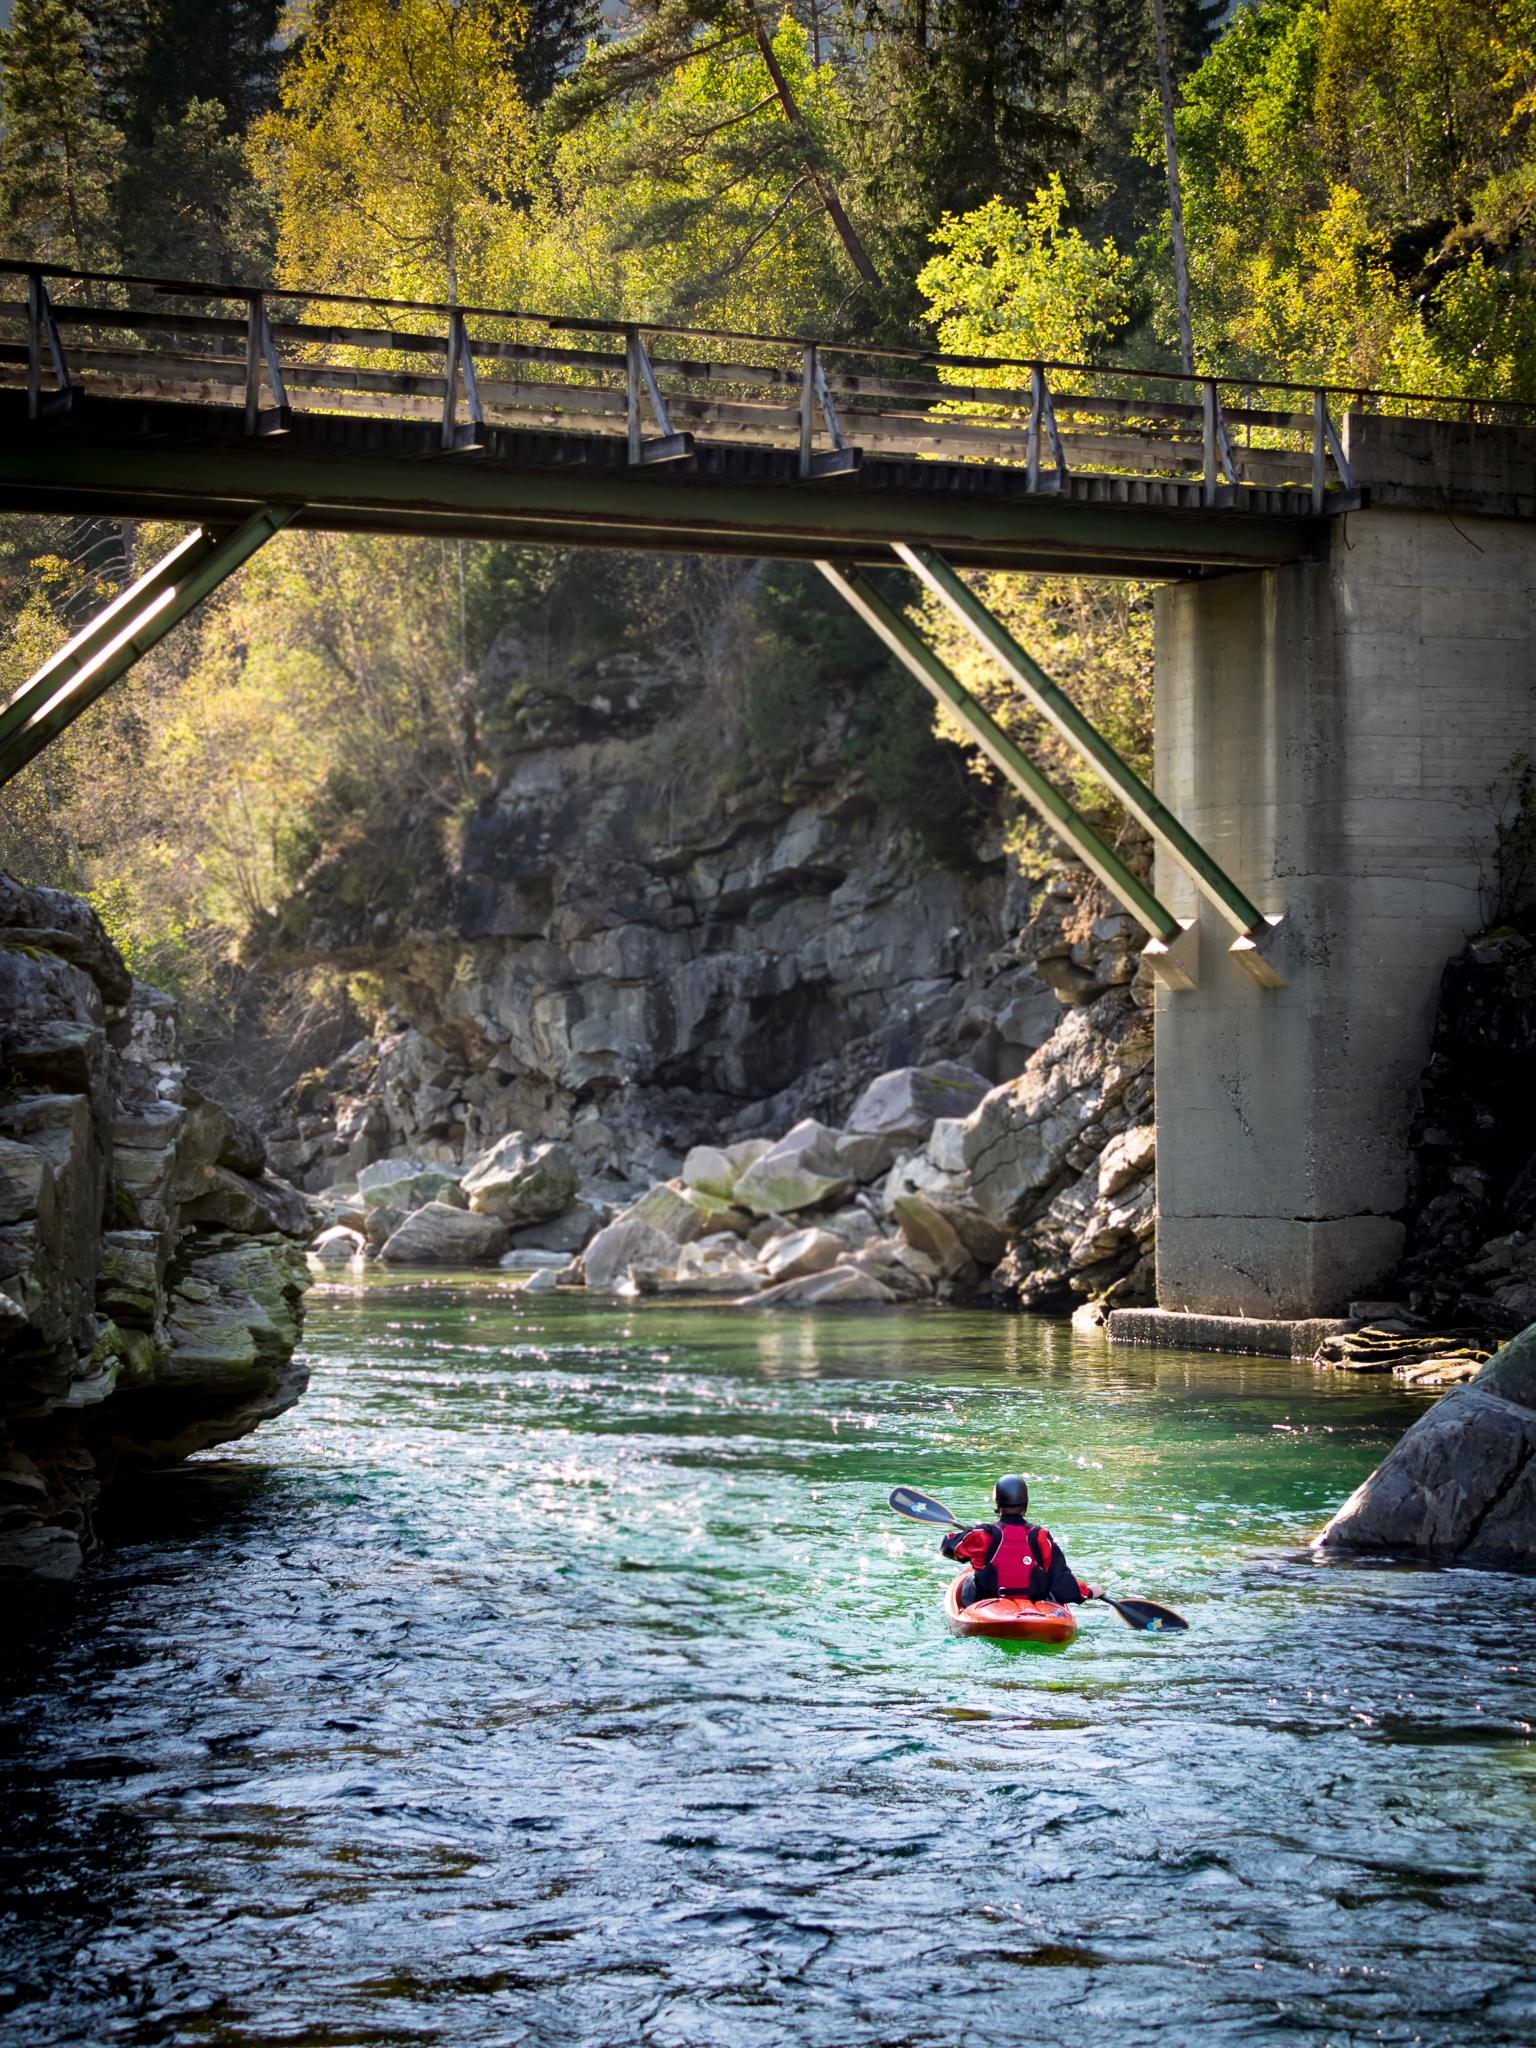 Boat Scouting, Raundalselva. Norway, 2016.